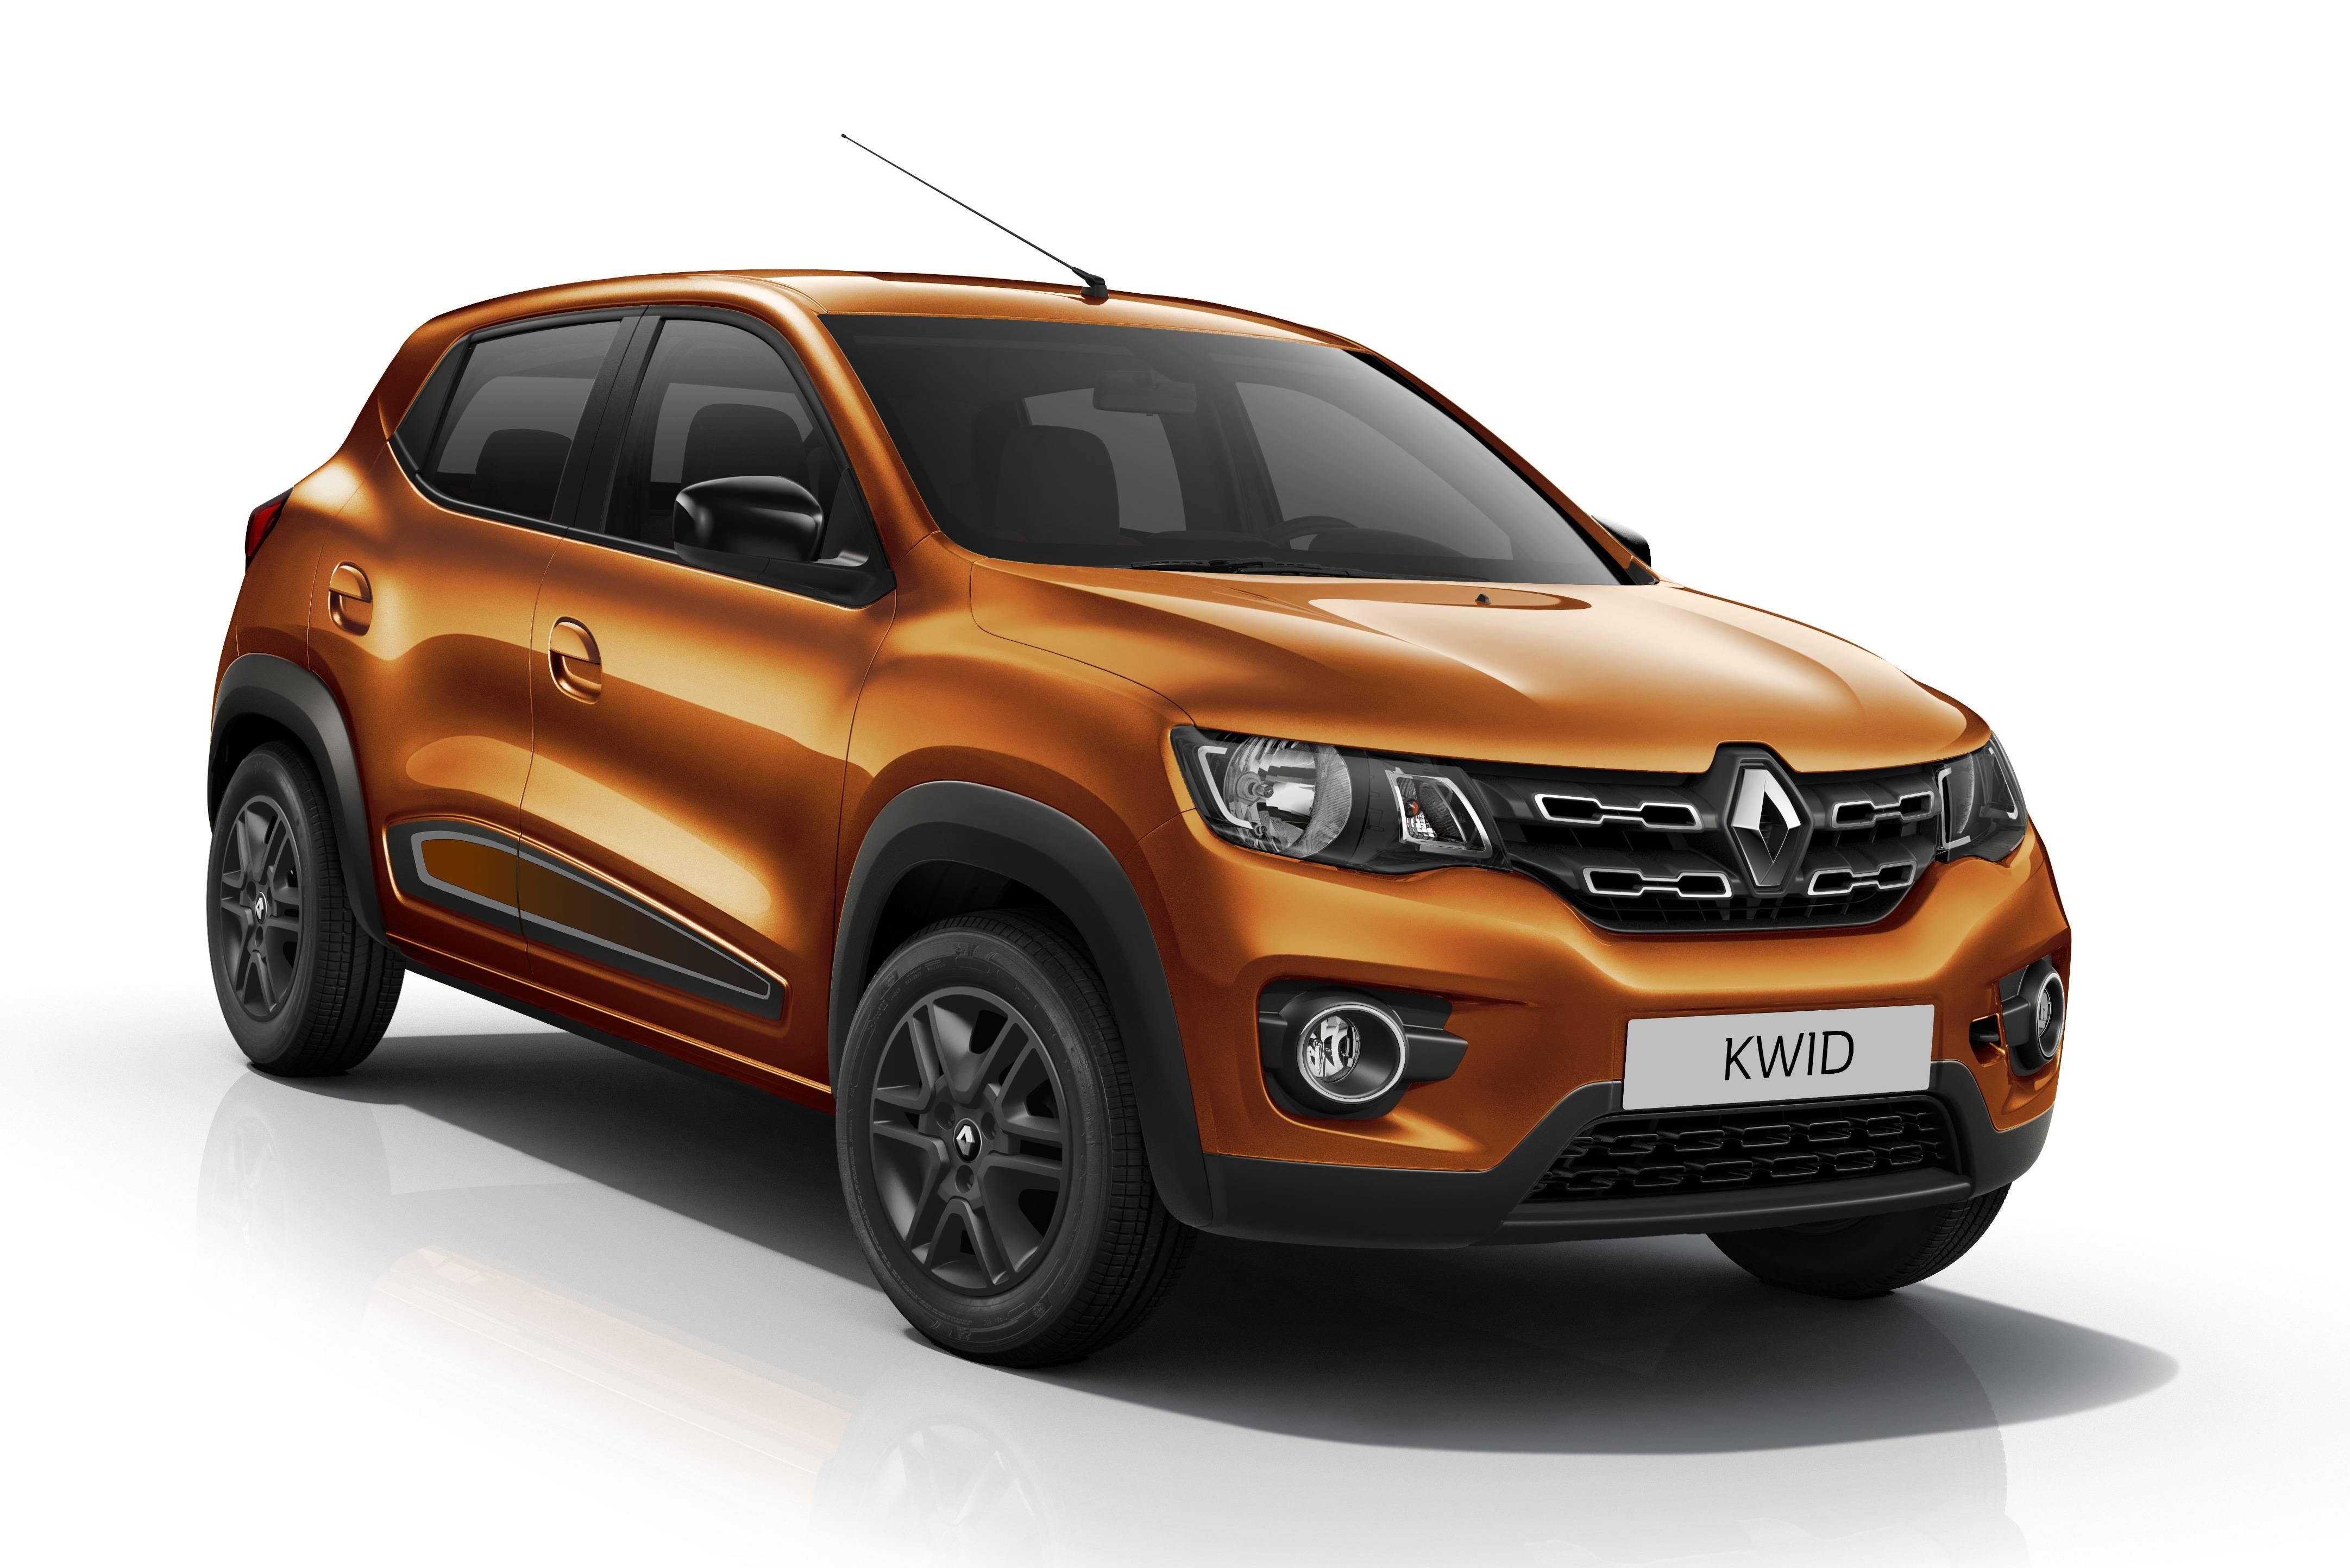 Novo Renault Kwid 2019 - Preço, Consumo, Ficha Técnica, Fotos